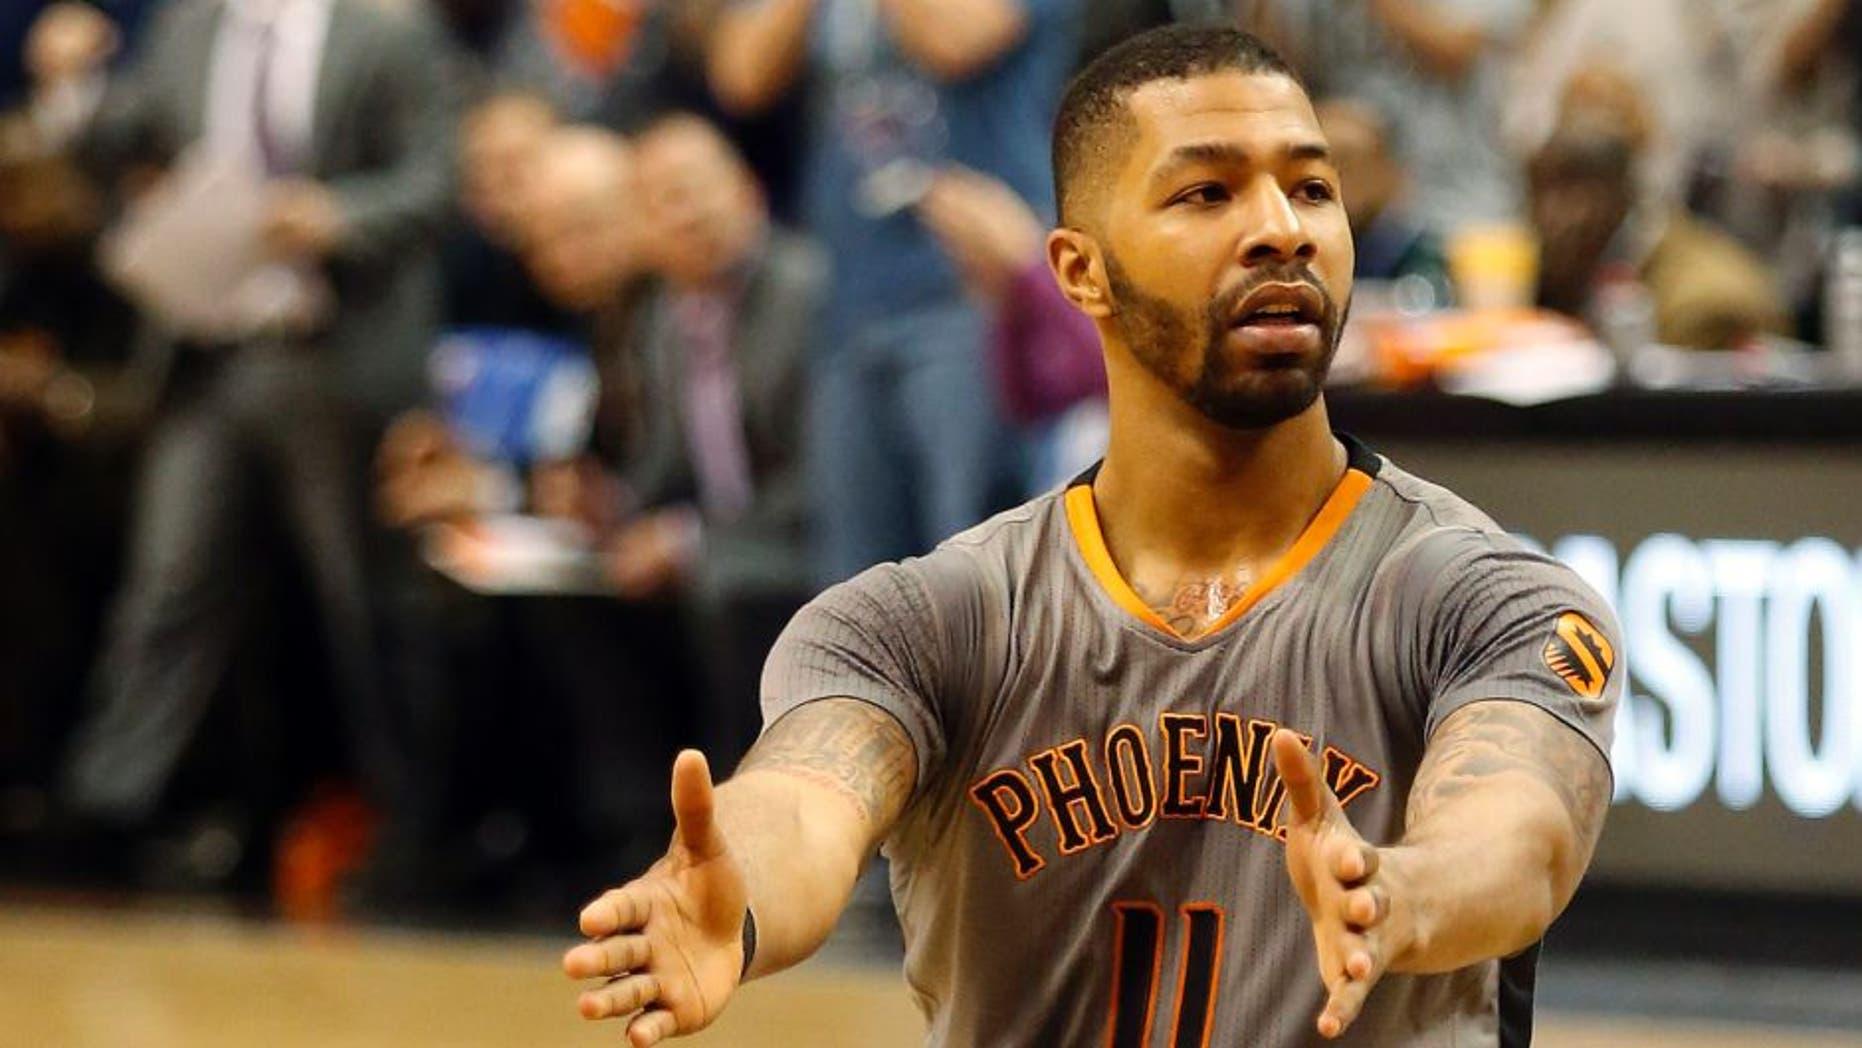 Feb 26, 2015; Phoenix, AZ, USA; Phoenix Suns forward Markieff Morris (11) reacts after scoring against the Oklahoma City Thunder during the fourth quarter at US Airways Center. Mandatory Credit: Rick Scuteri-USA TODAY Sports